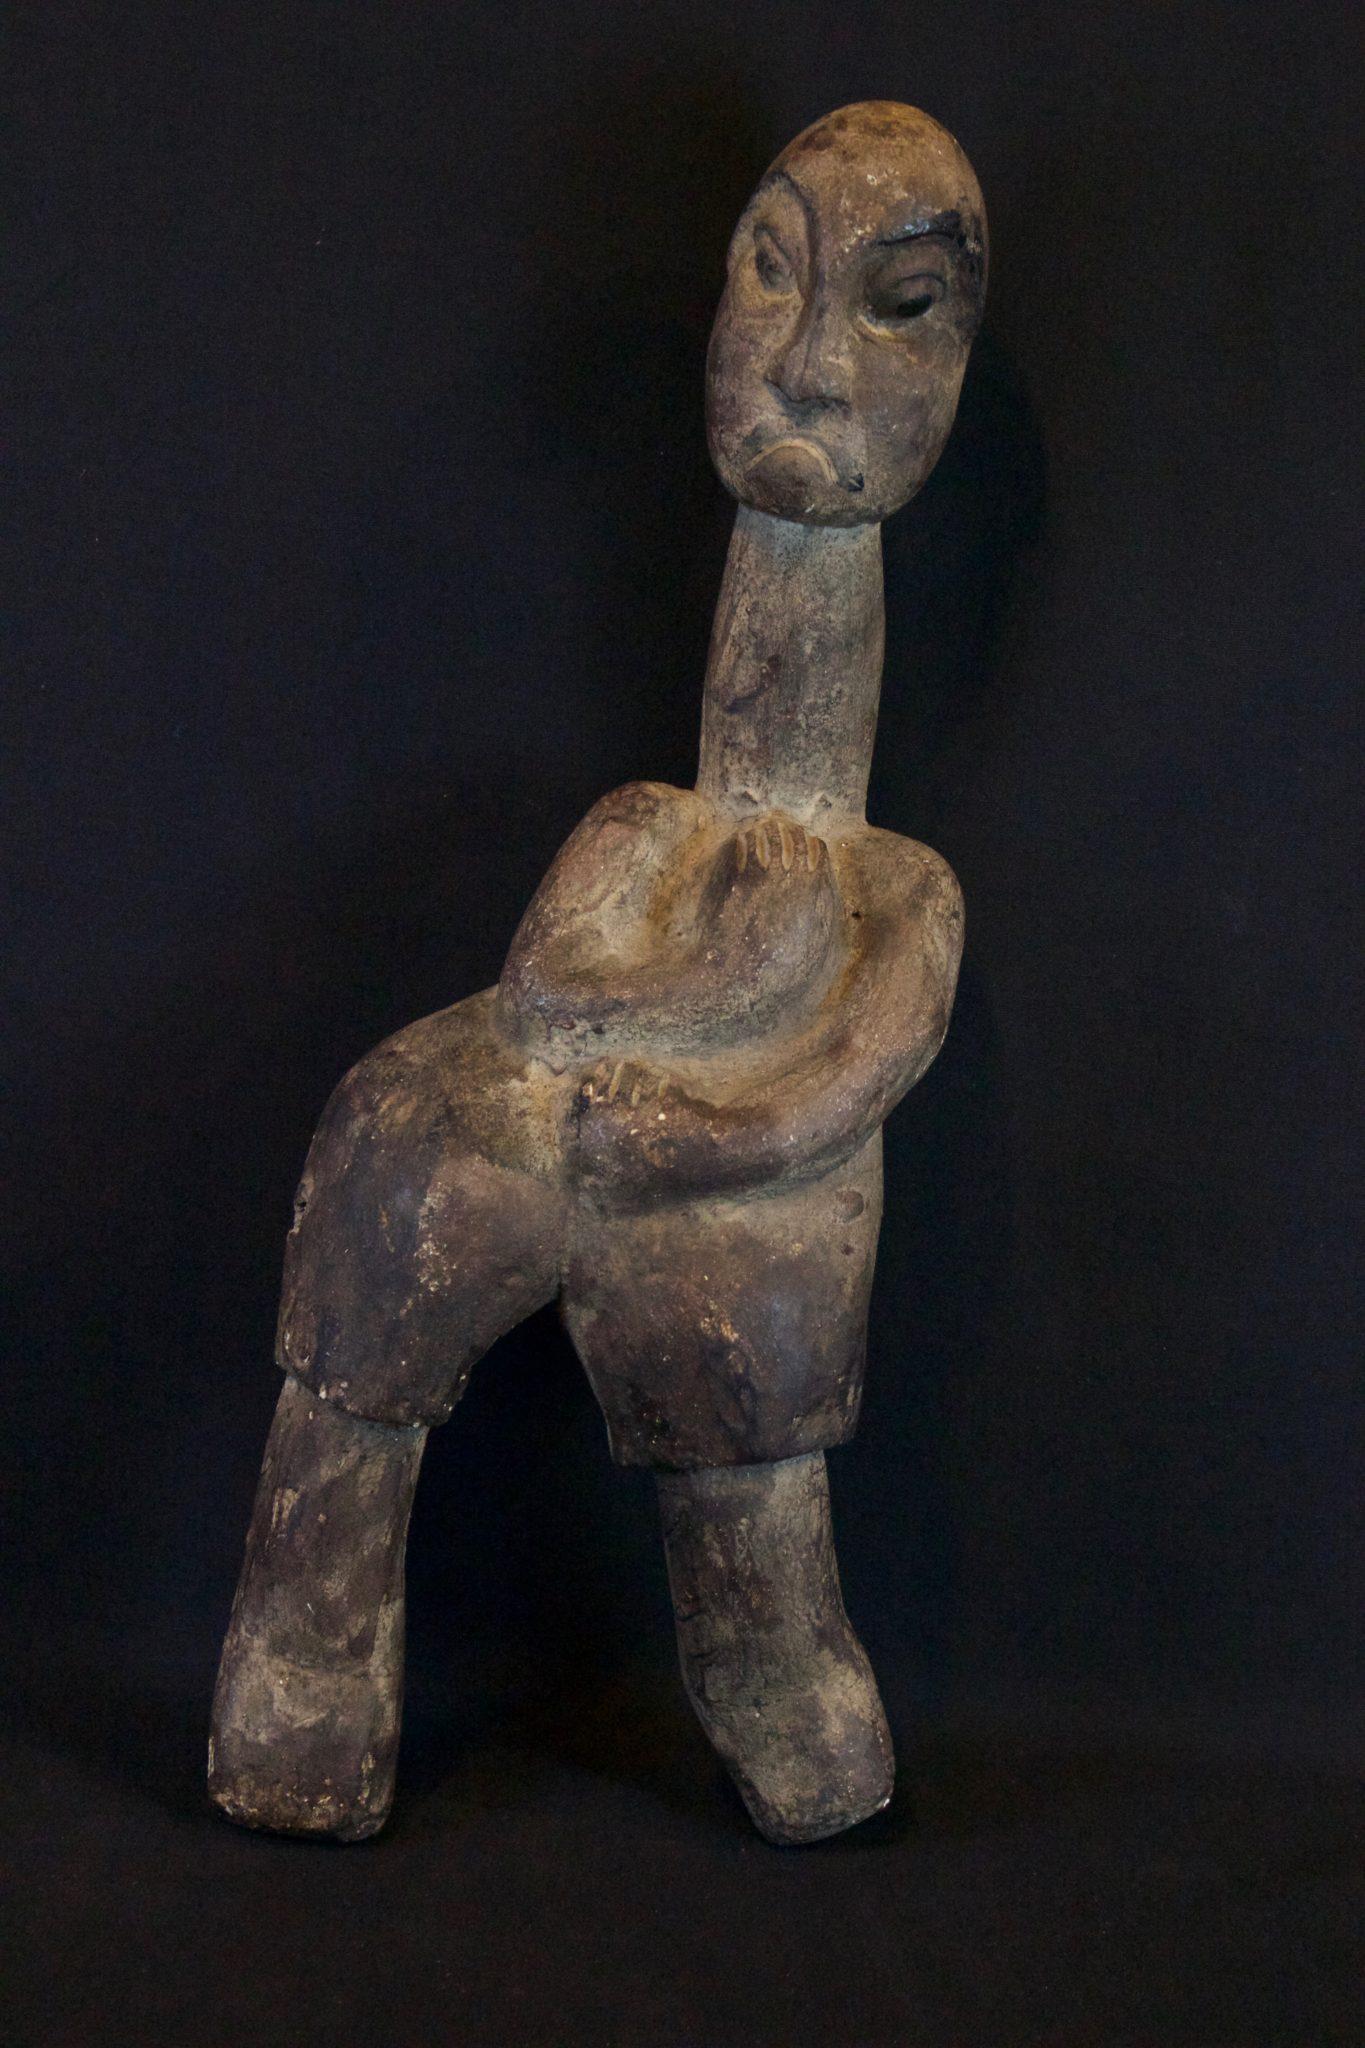 "Shaman Magic Figure, Lombok Island, Lesser Sunda Islands, Indonesia, Mid 20th c, Wood, paint. Used for calling spirits and for healing rituals. 16"" x 6"" x 4"", $360."